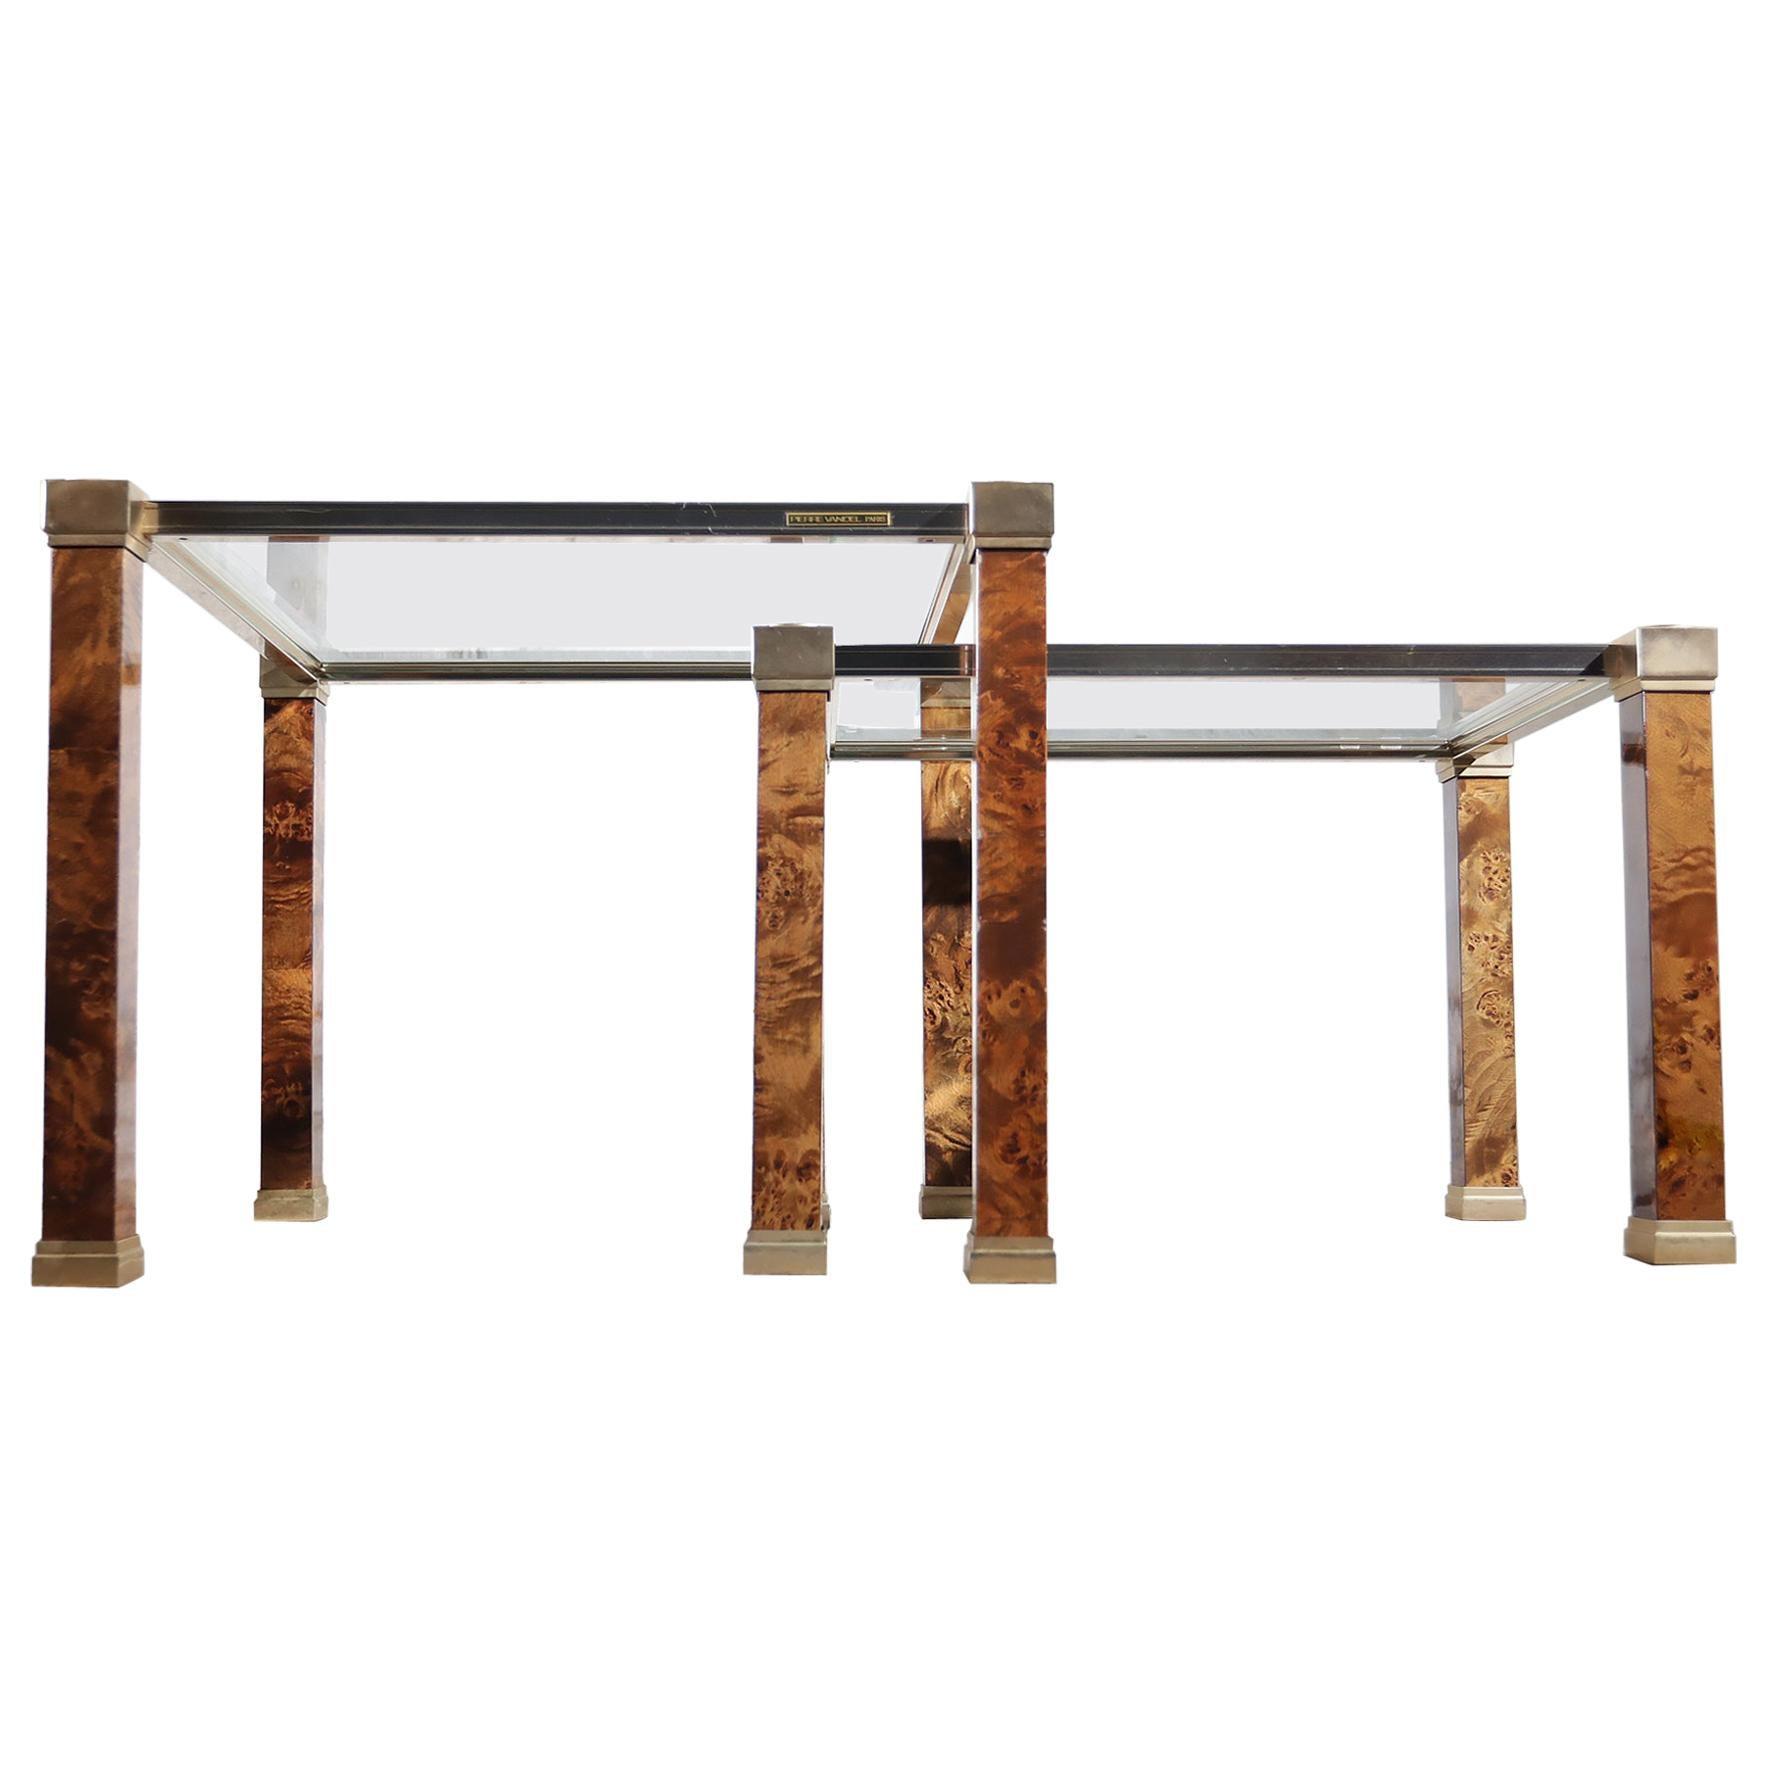 Rare Set of Pierre Vandel Paris Two-Tier Side Tables Mid-Century Modern